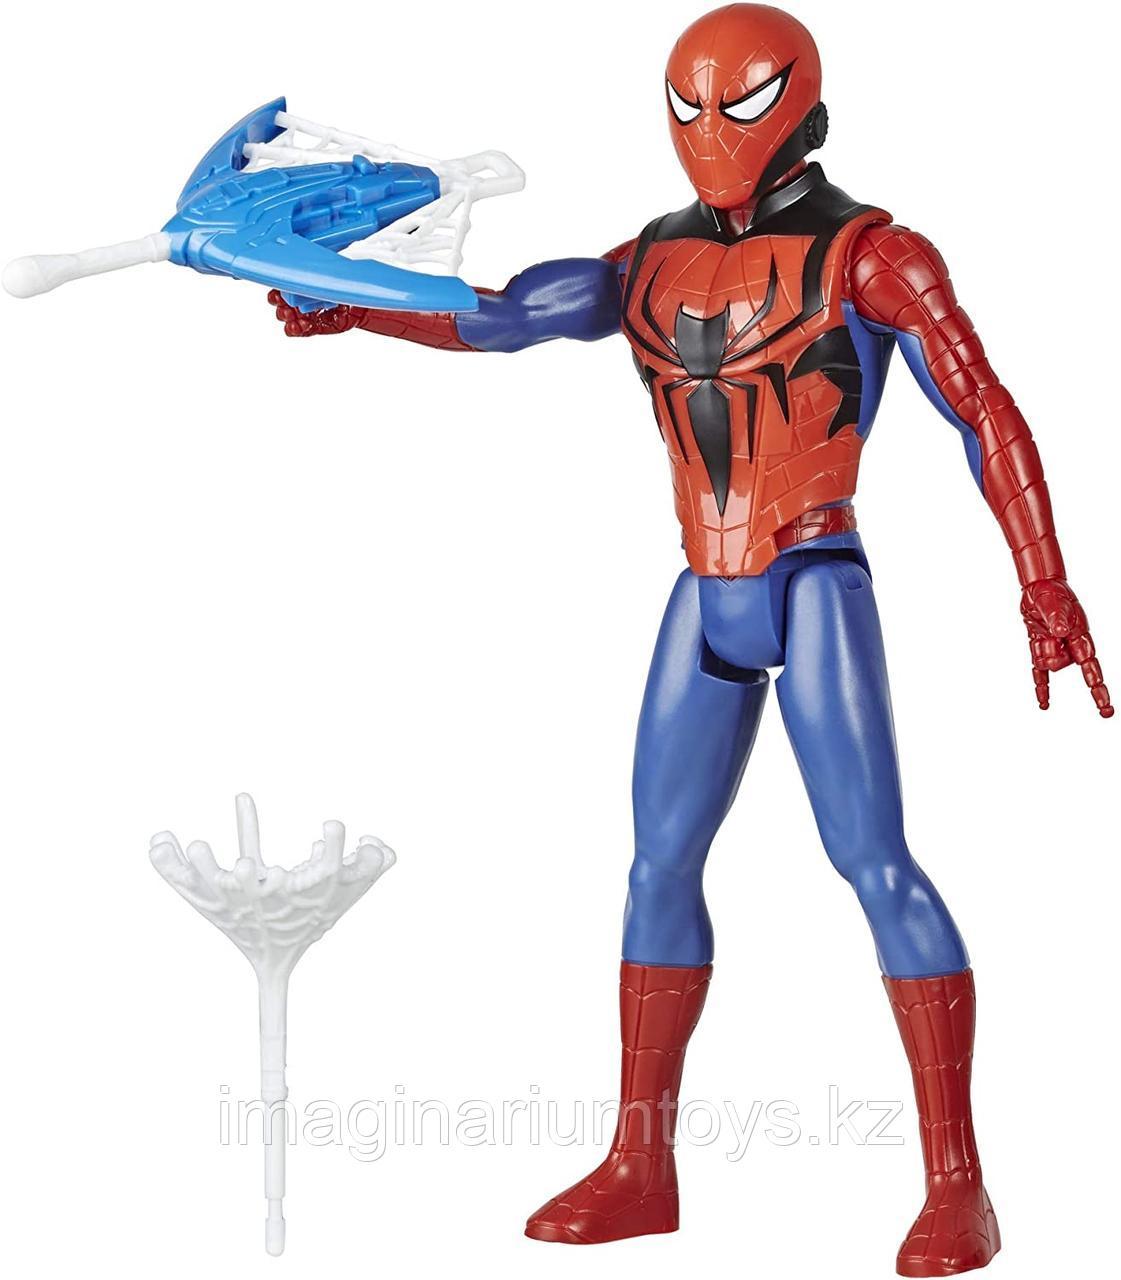 Фигурка Человек-паук Spider-man 30 см с аксессуарами